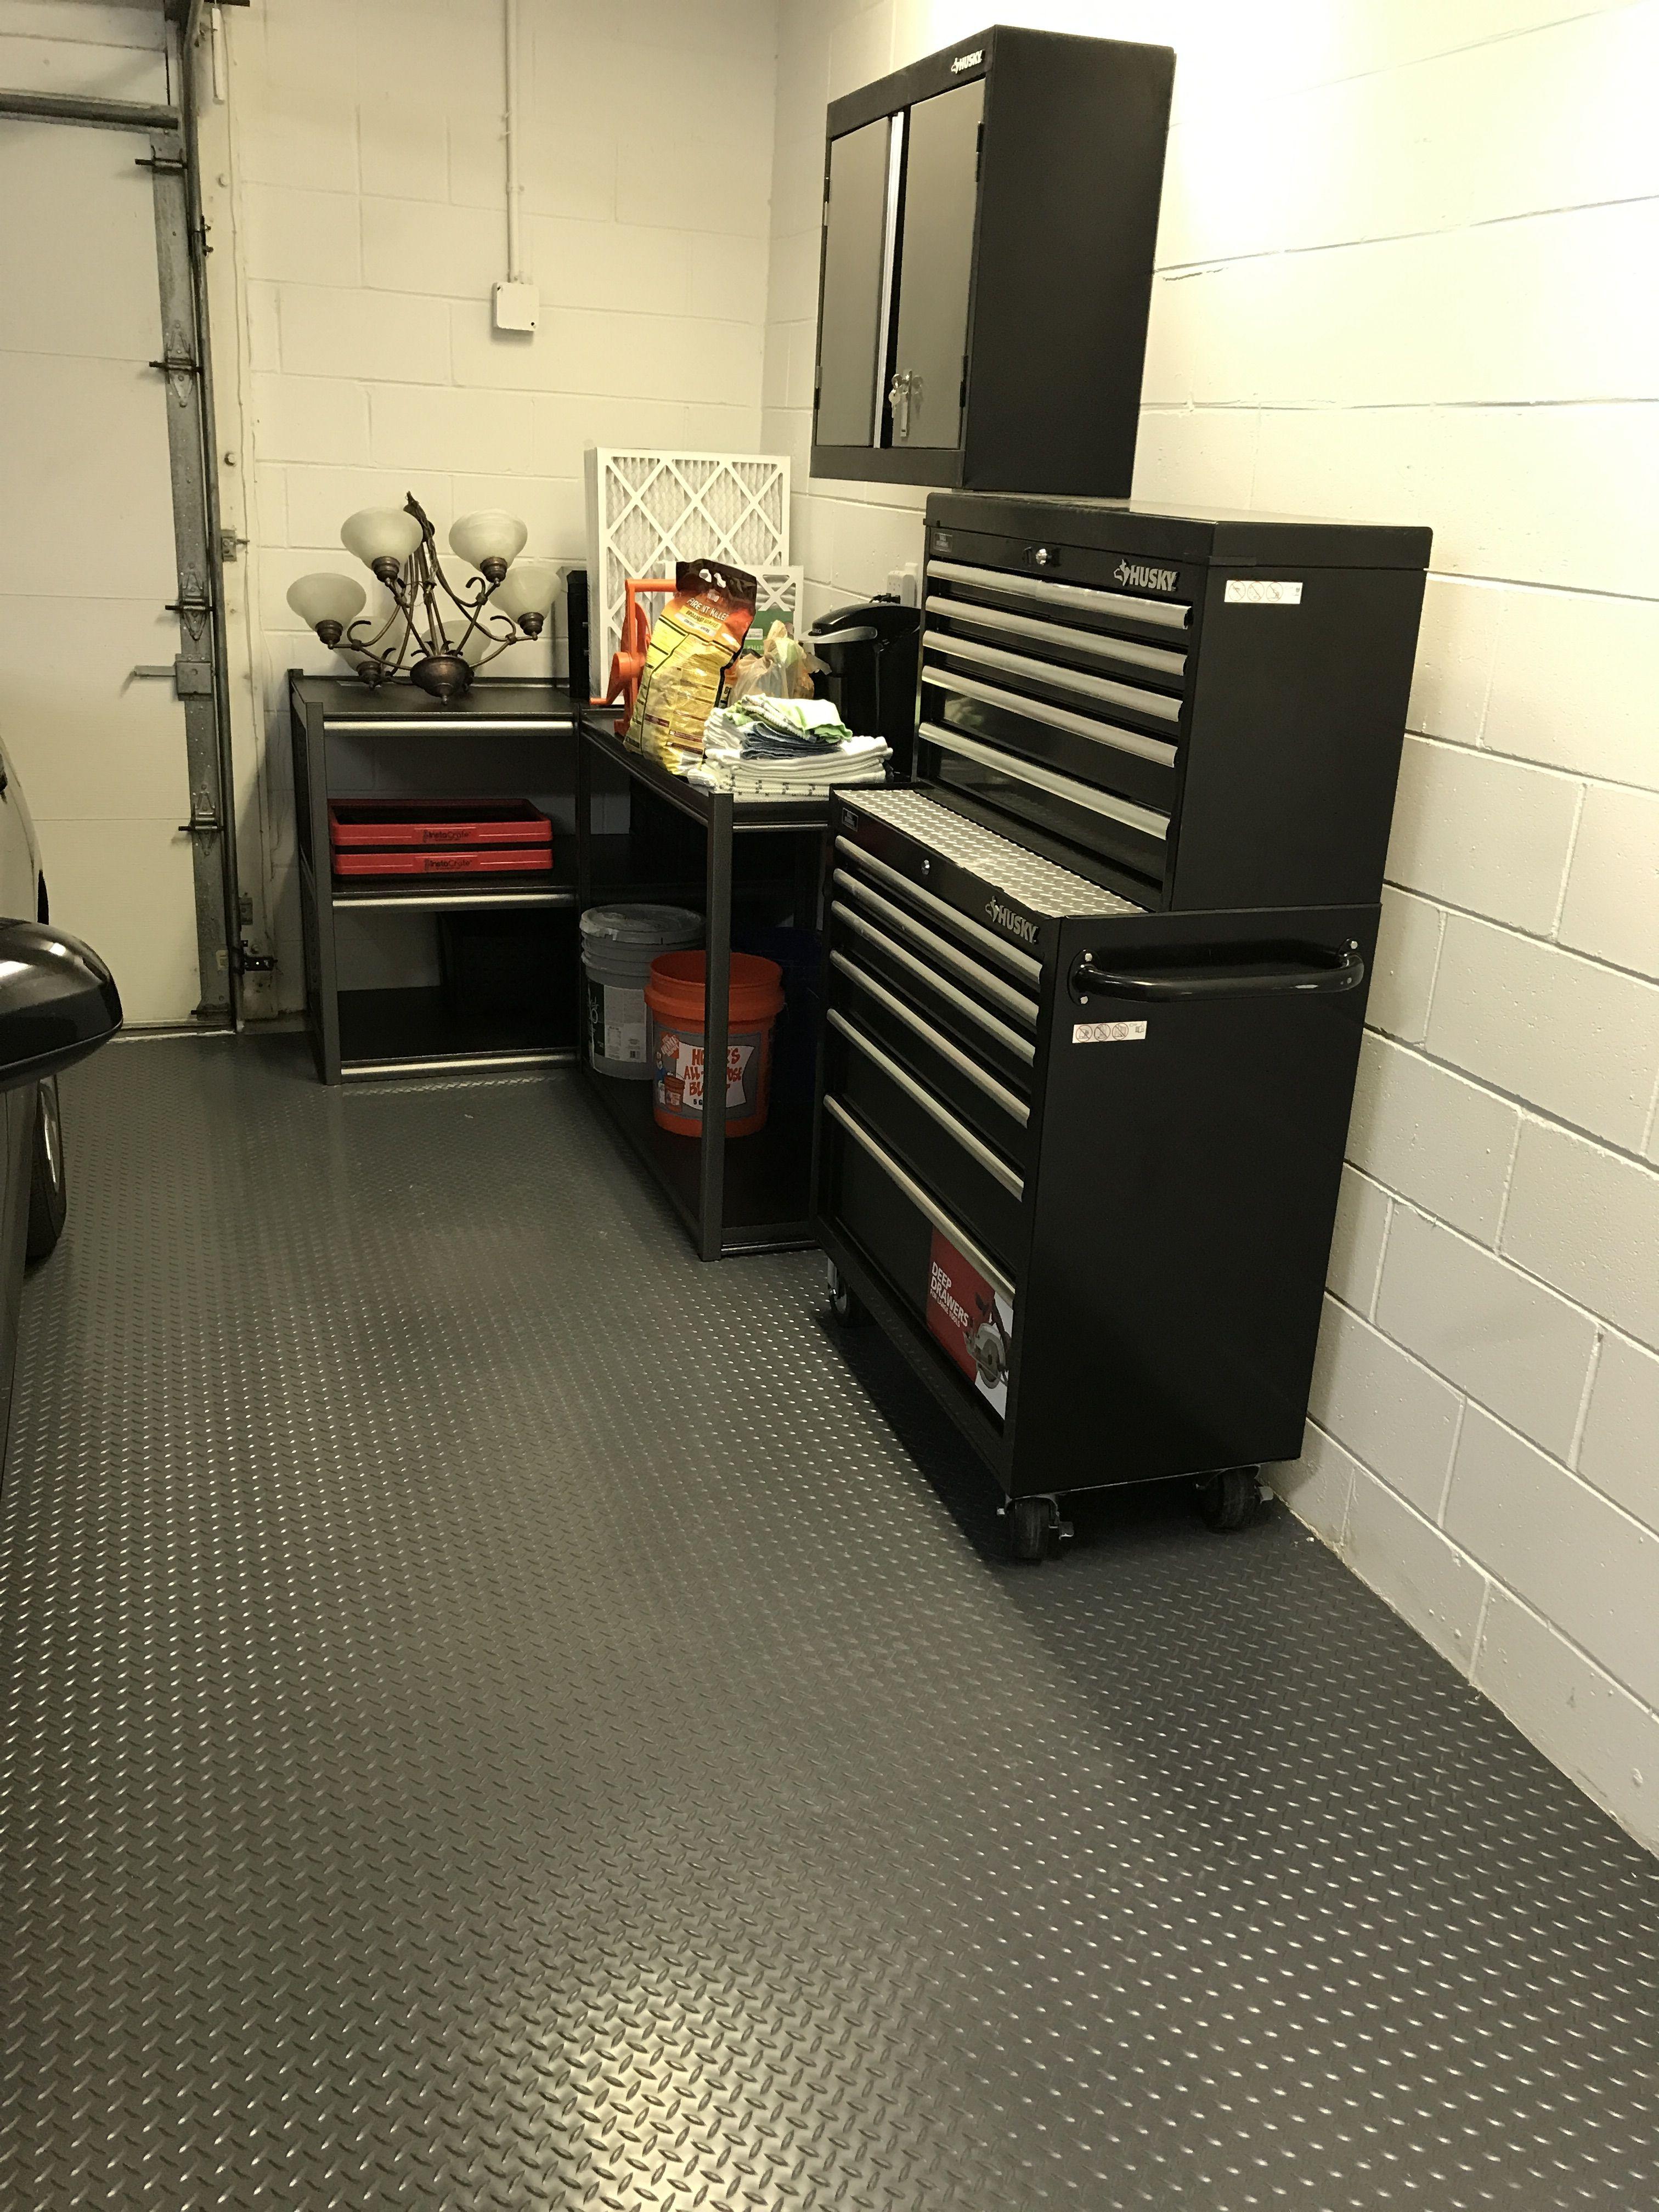 Costco Car Floor Mats : costco, floor, Costco, Rubber, Garage, Floor, Diamond, Pattern., Cheaper, Epoxy., Flooring,, Mats,